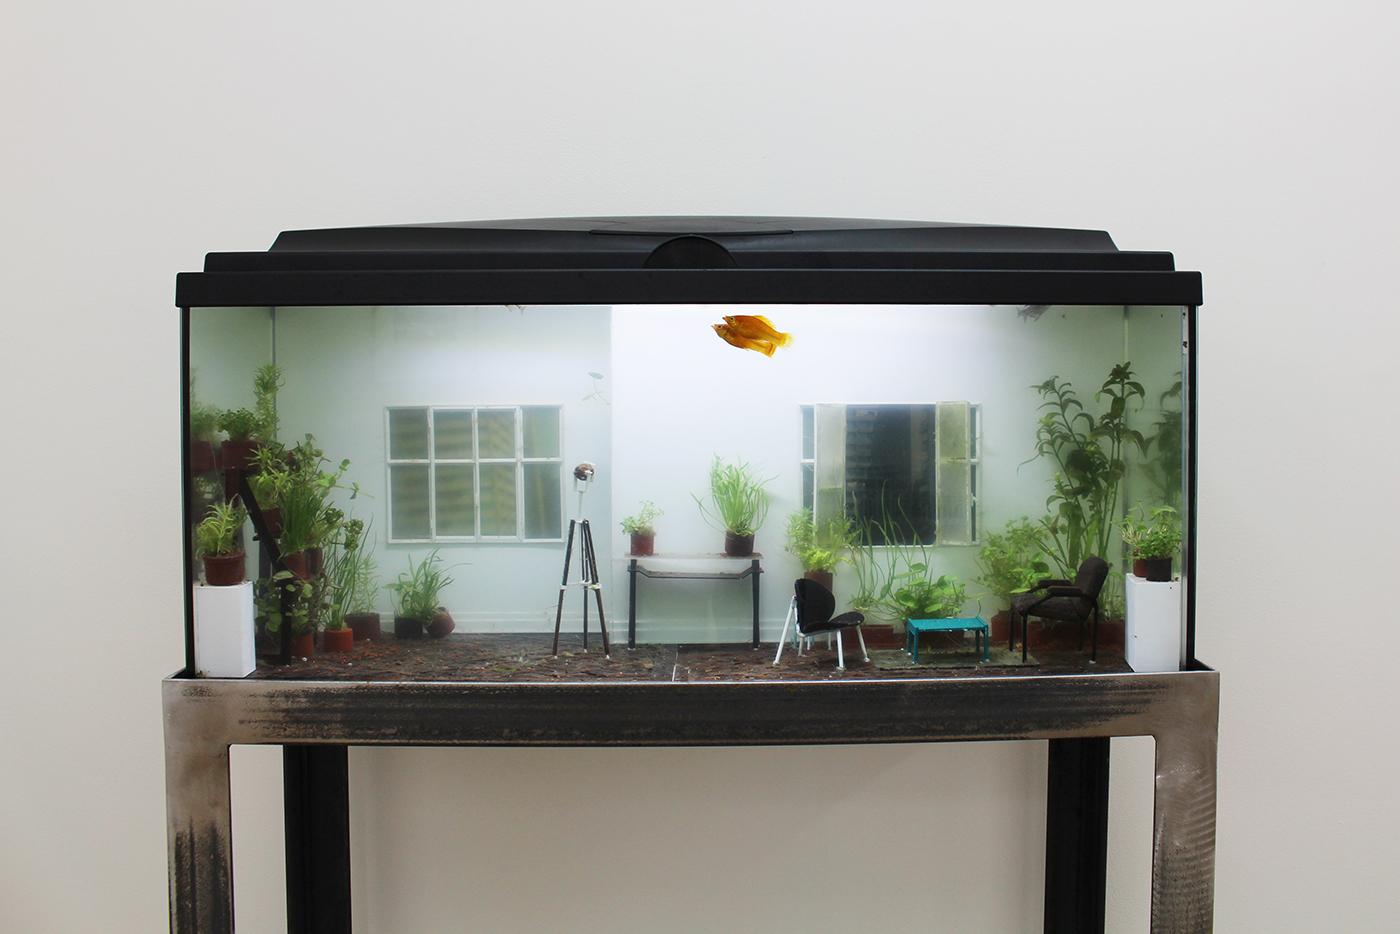 Rodrigo Arteaga, Öekologie, 2016, Aquarium with live fishes, live plants and miniature elements, 80 x 30 x 40